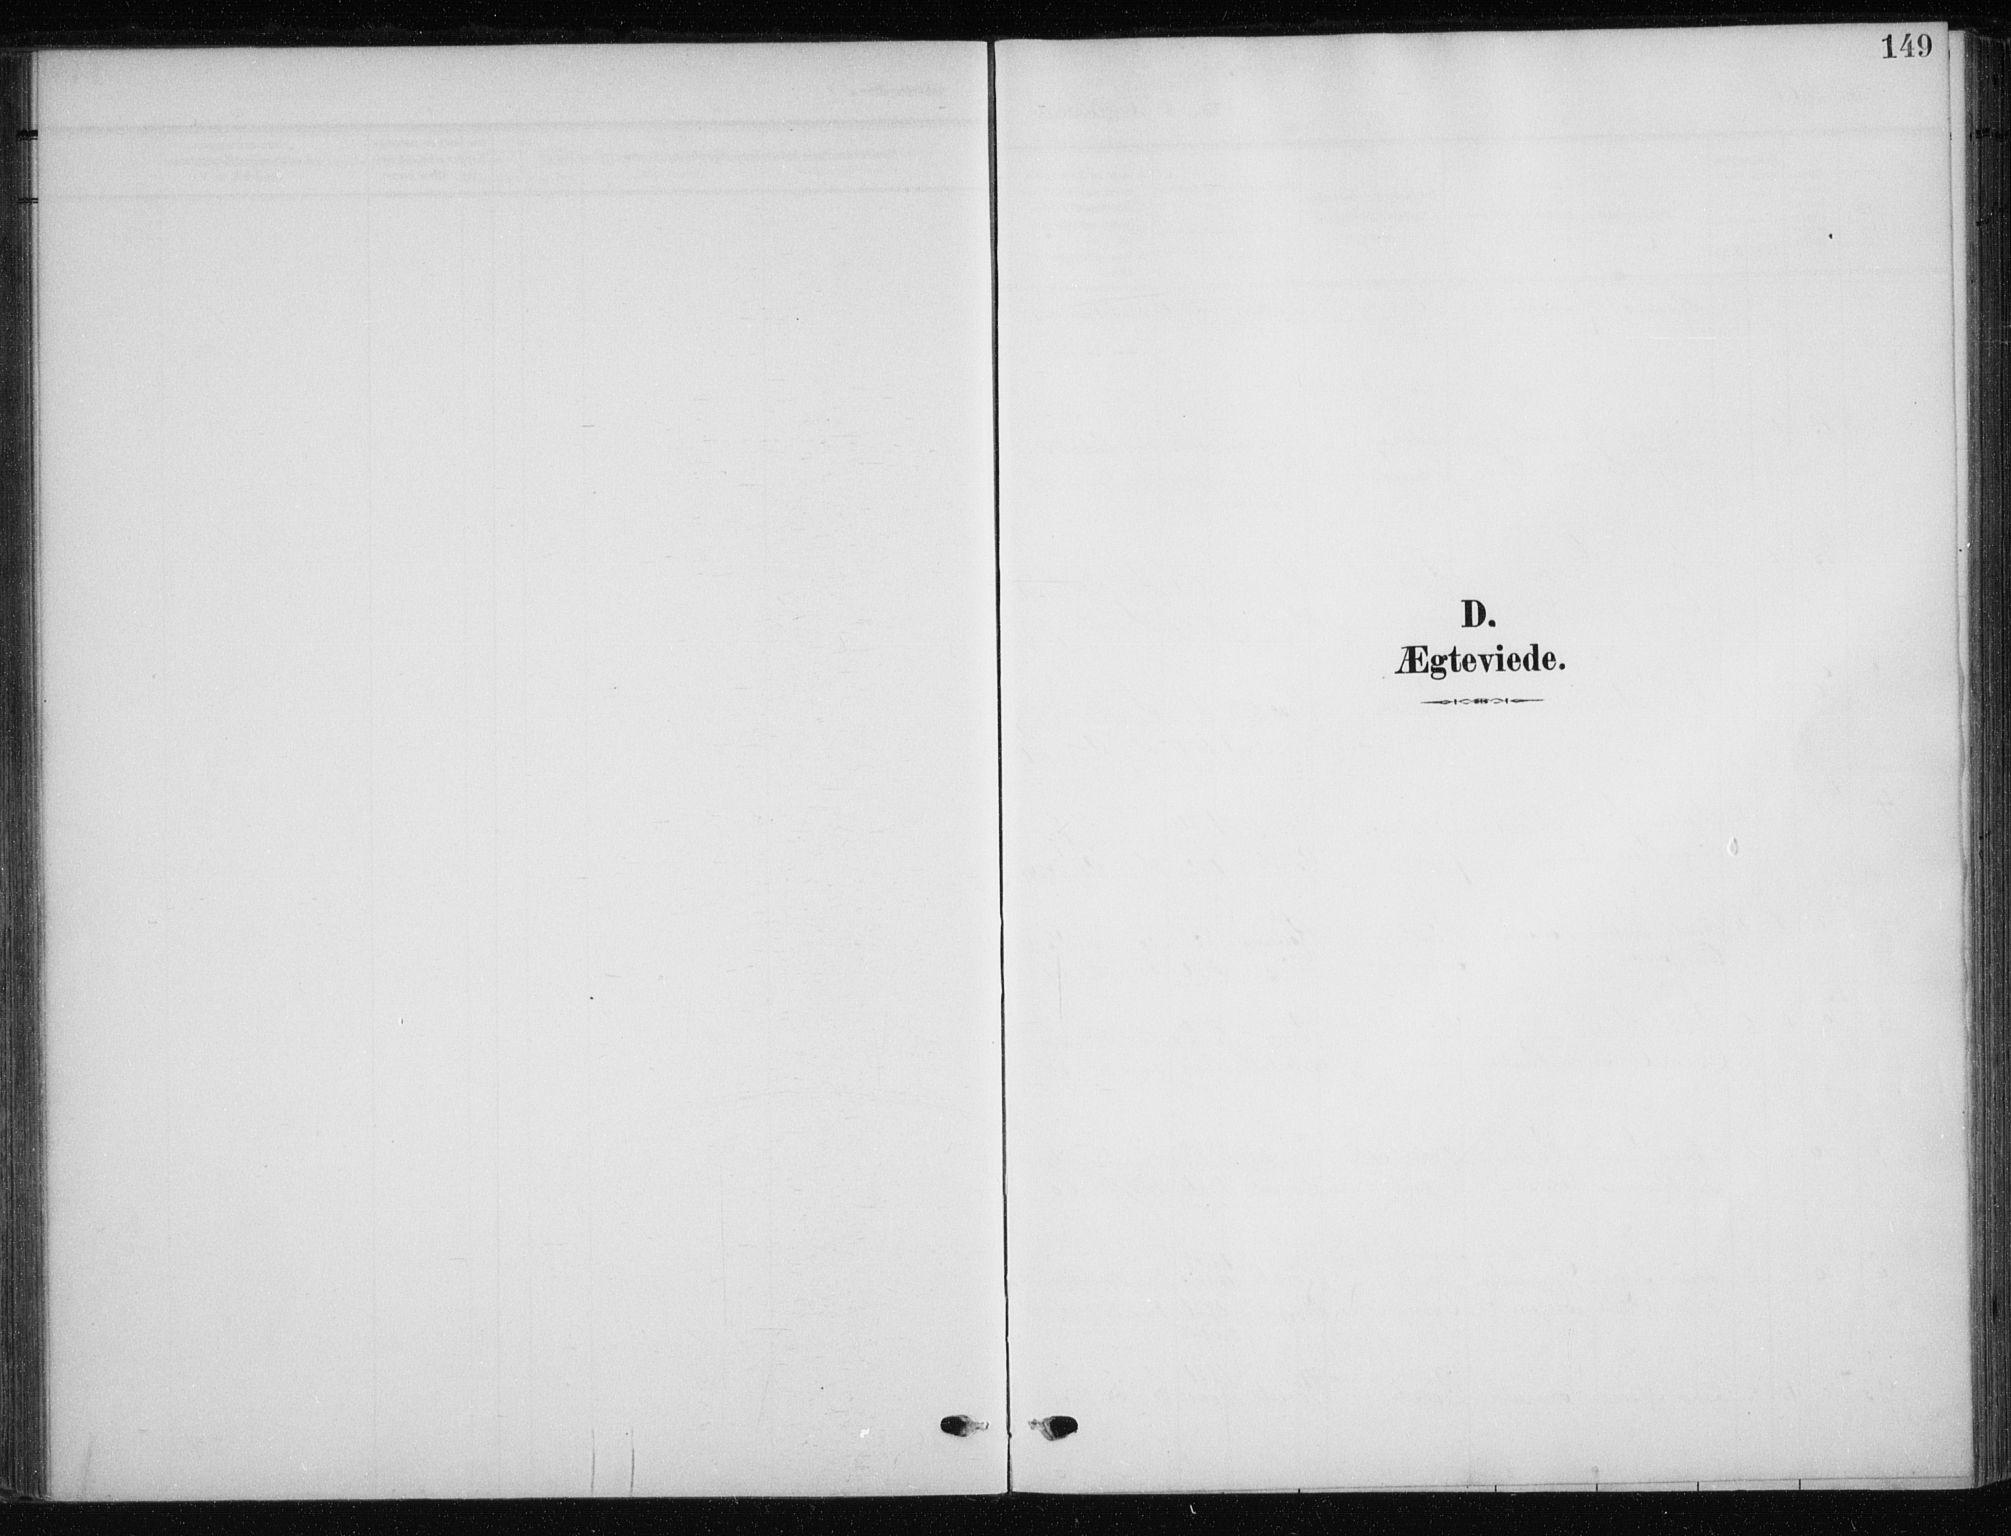 SATØ, Kistrand/Porsanger sokneprestembete, H/Ha/L0014.kirke: Ministerialbok nr. 14, 1908-1917, s. 149